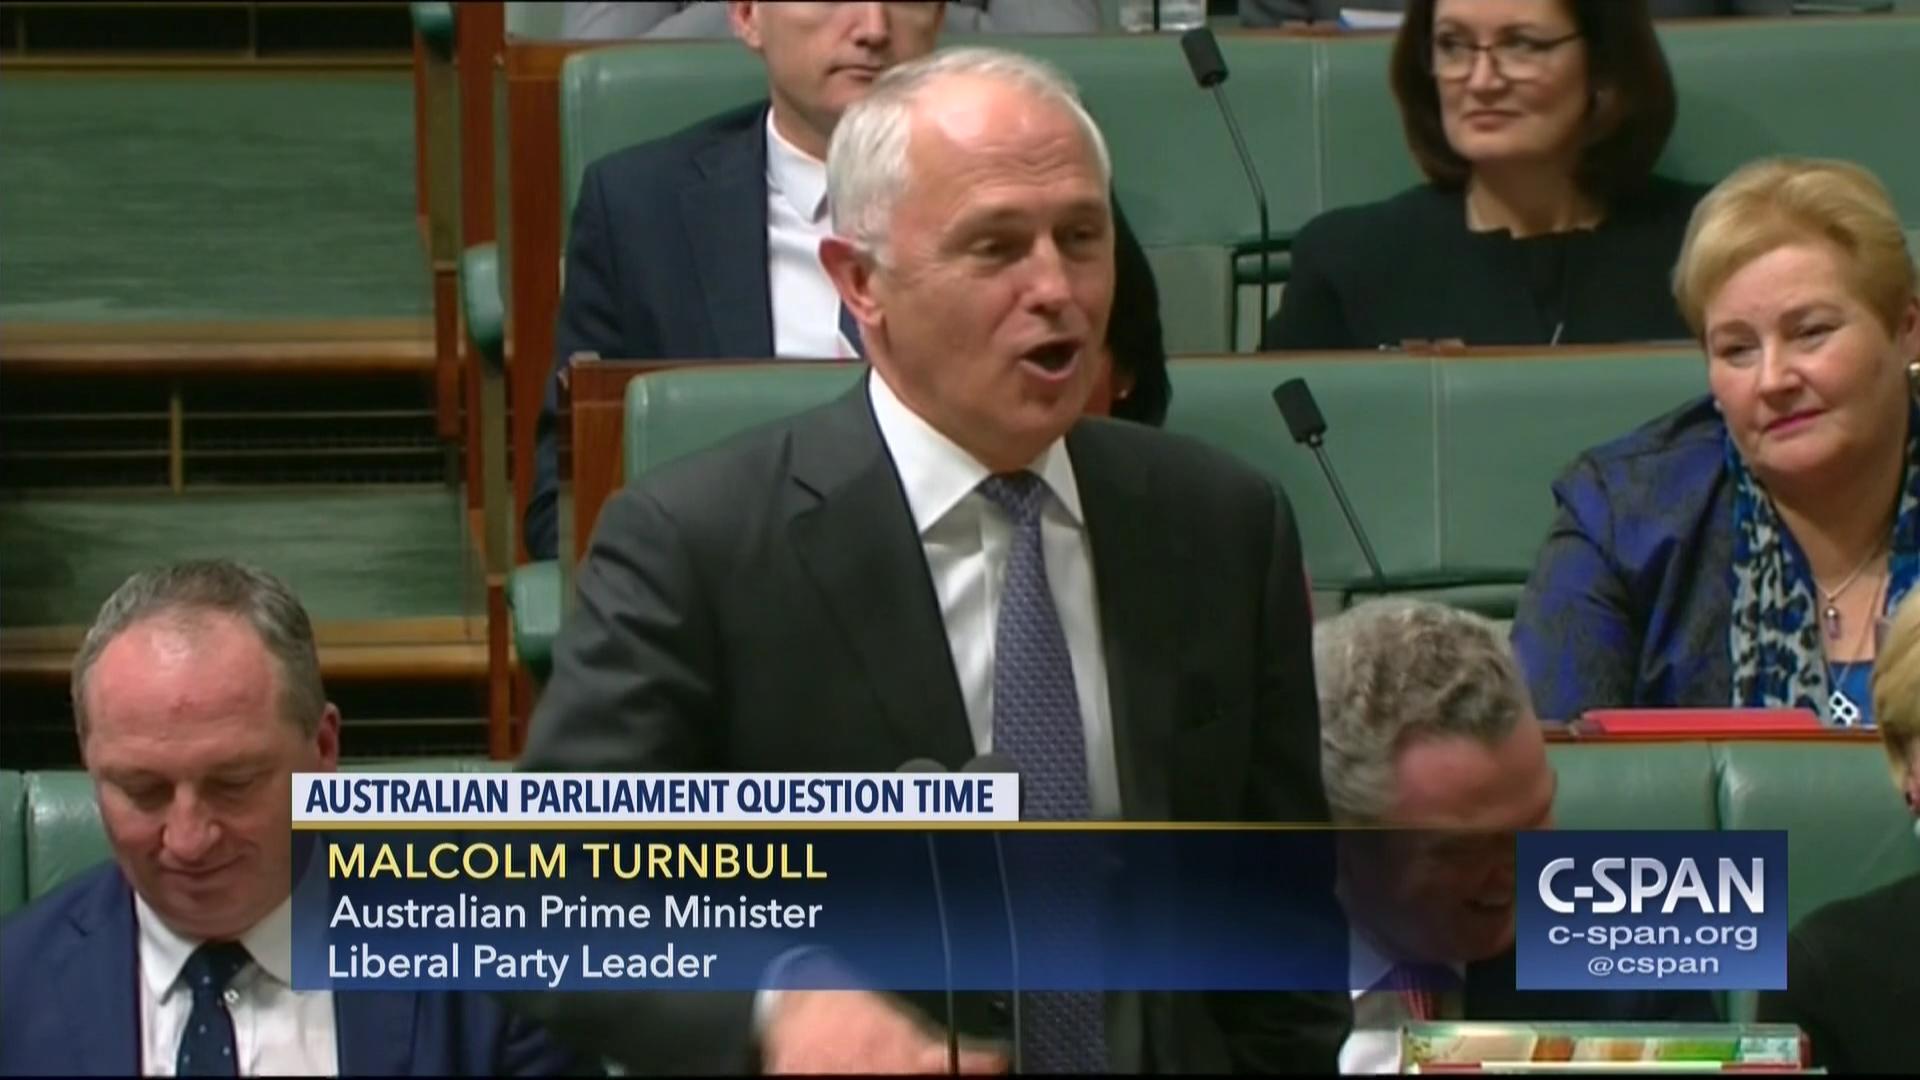 Australian Parliament Question Time Highlights